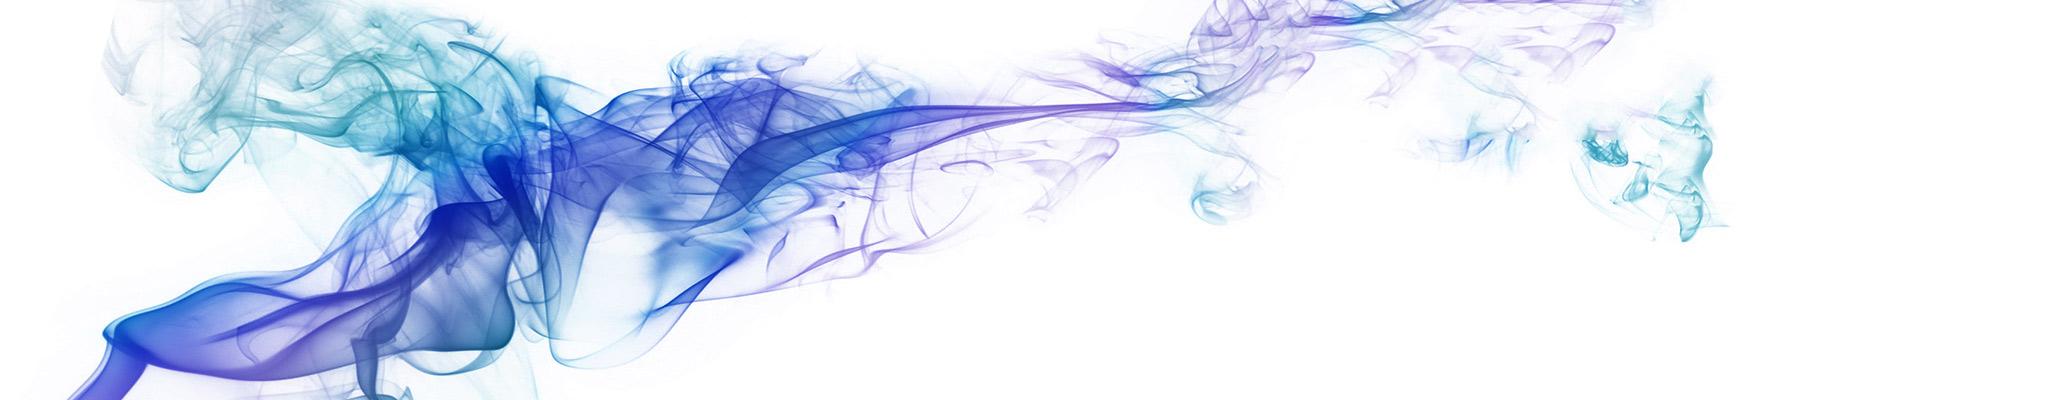 controlli analisi fumi canne fumarie e camini